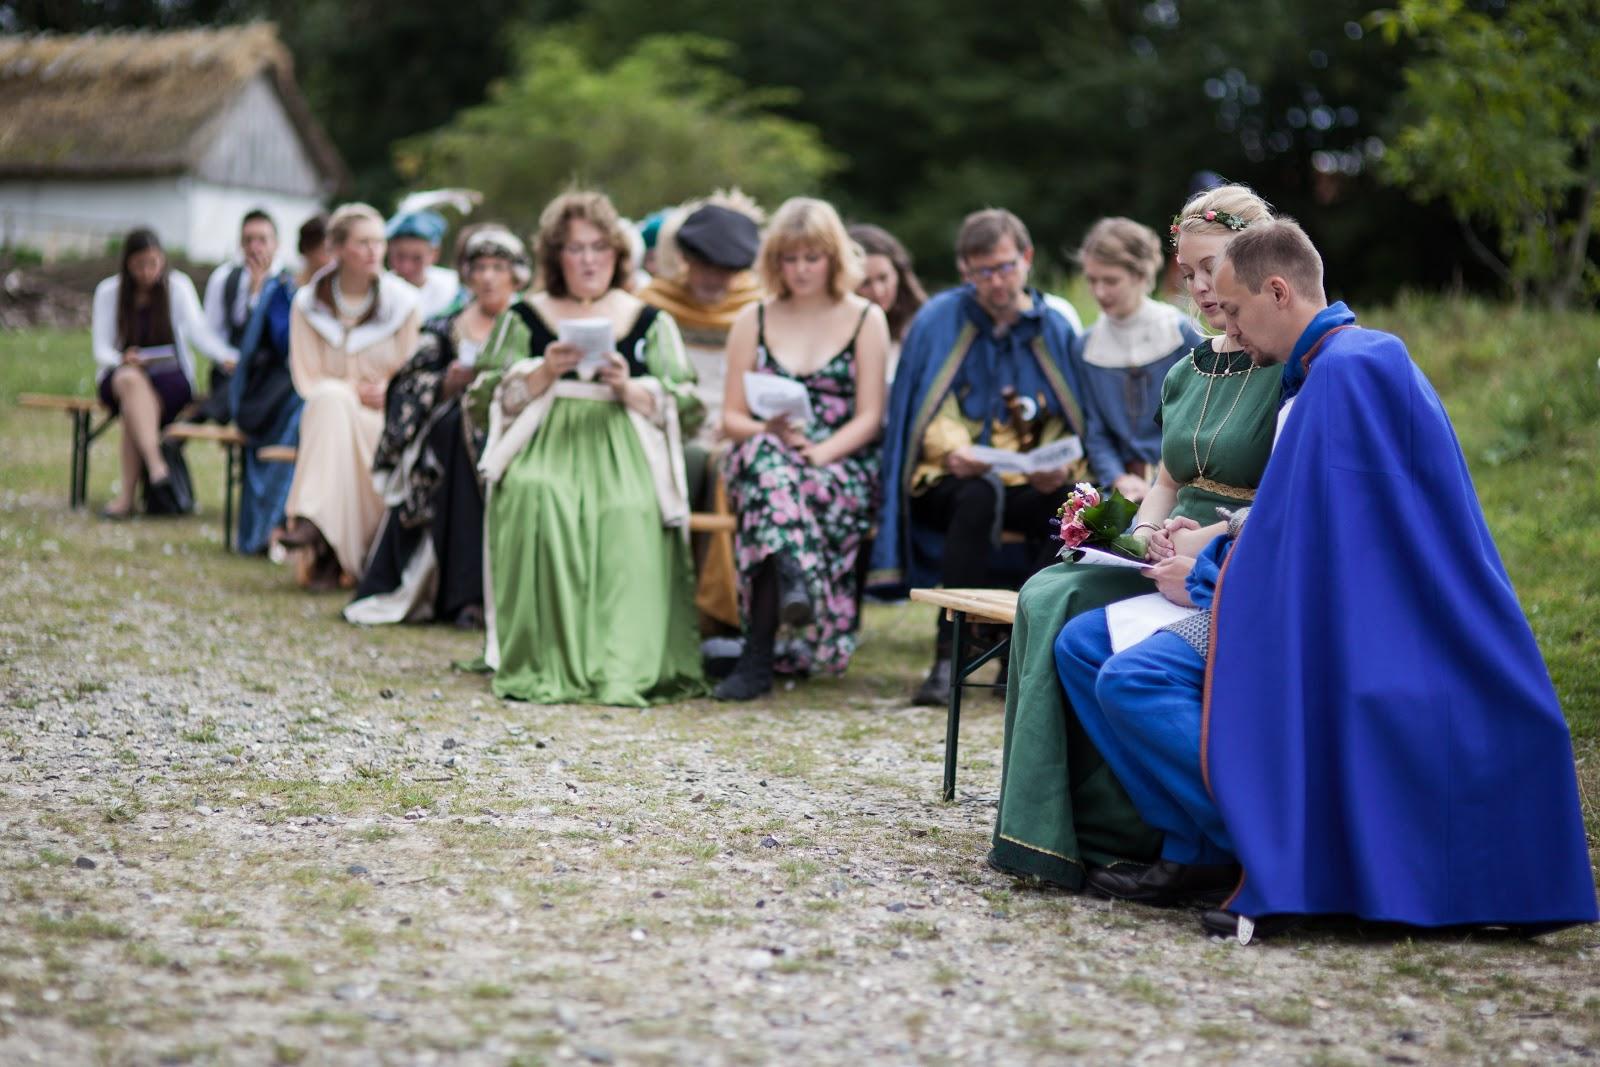 medieval wedding ceremony - HD1600×1067